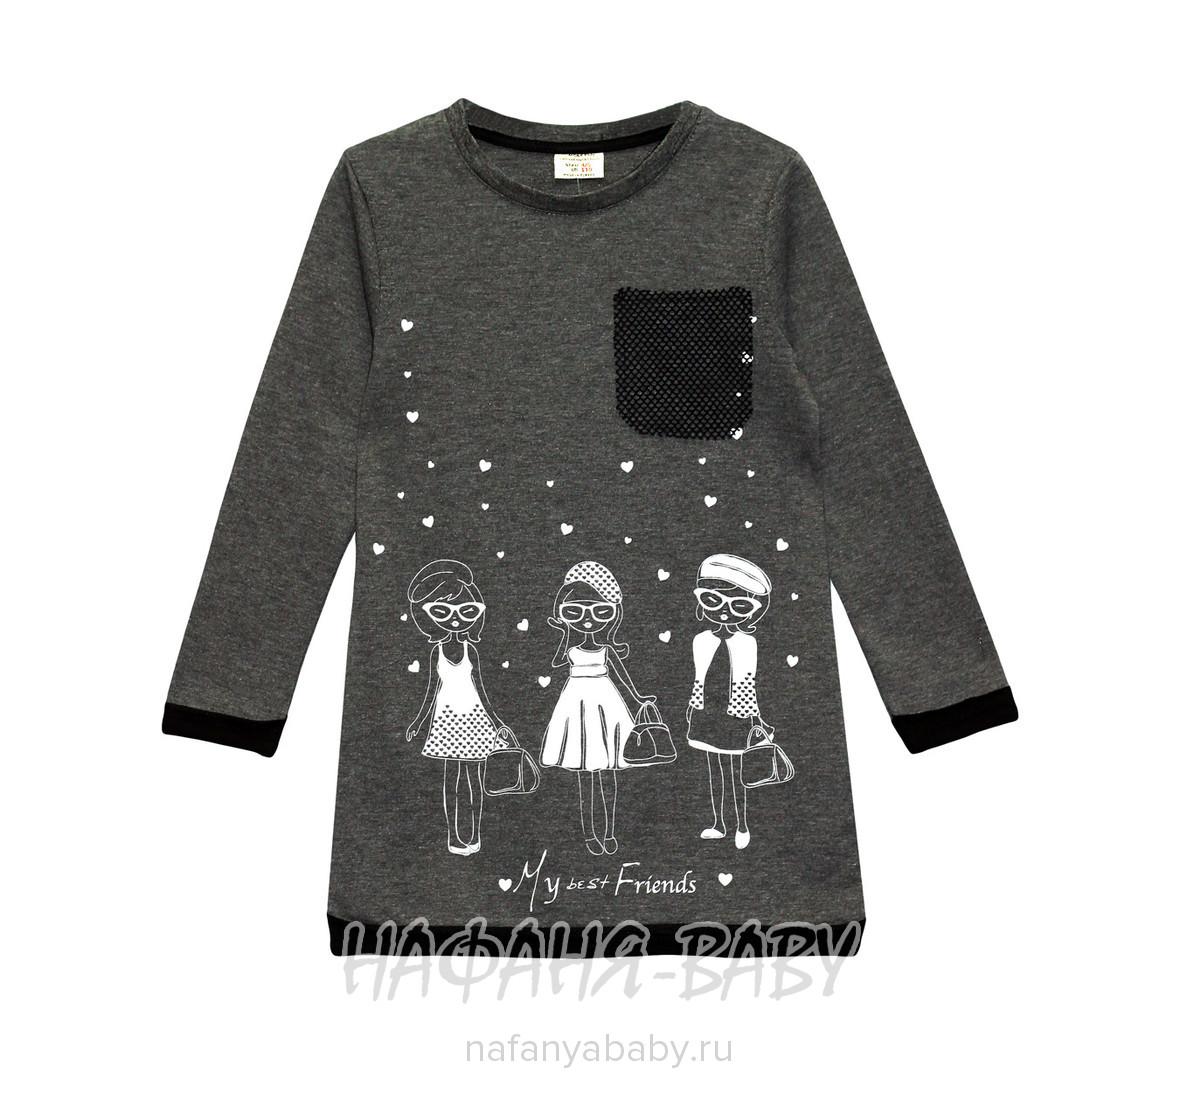 Детская трикотажная туника MG&T арт: 1135, 5-9 лет, 1-4 года, цвет темно-серый меланж, оптом Турция